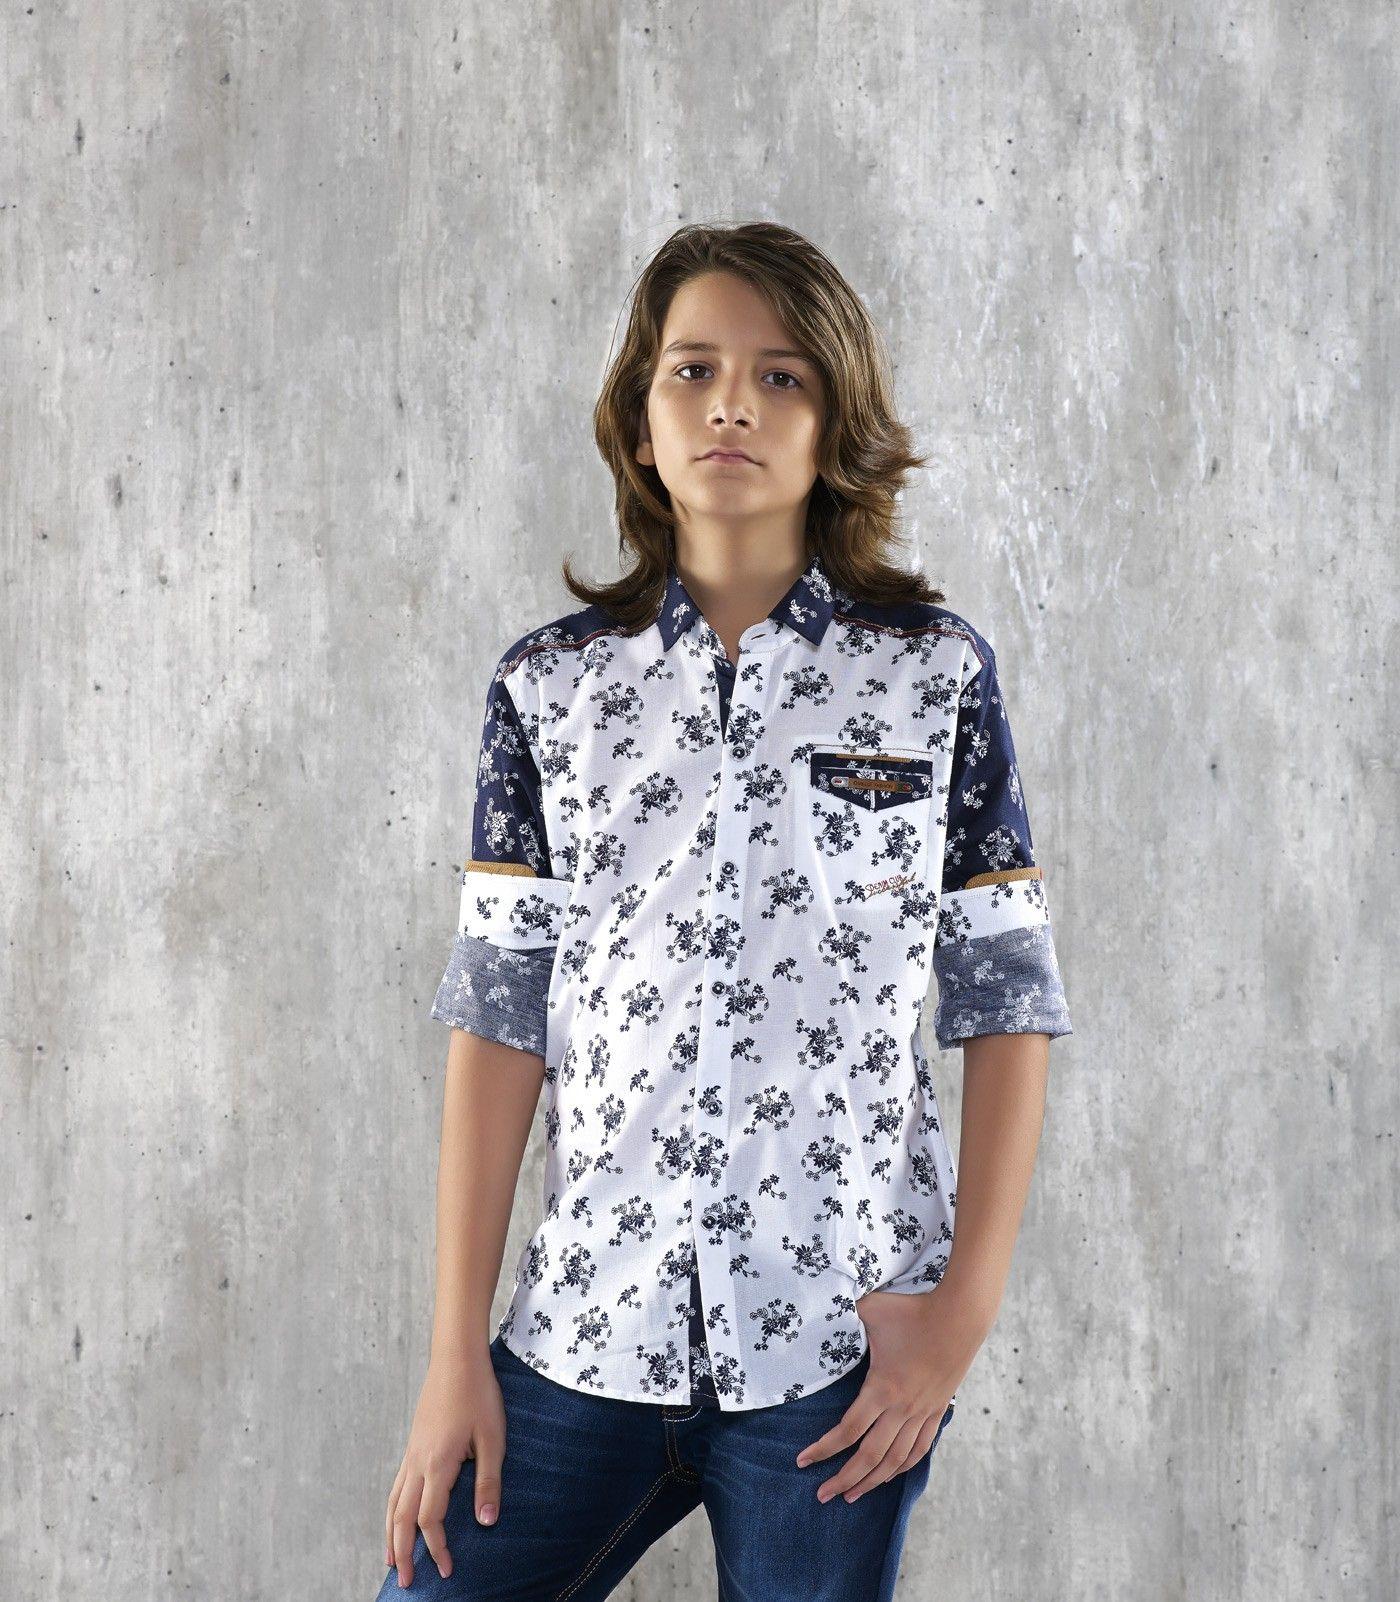 a04e444e8 BLAZO COTTON BOYS SHIRT Boys Blazo Brand shirt with full sleeve Regular fit  Casual plain Shirt. This shirt Has Same color placket and Wide Spread  collar.